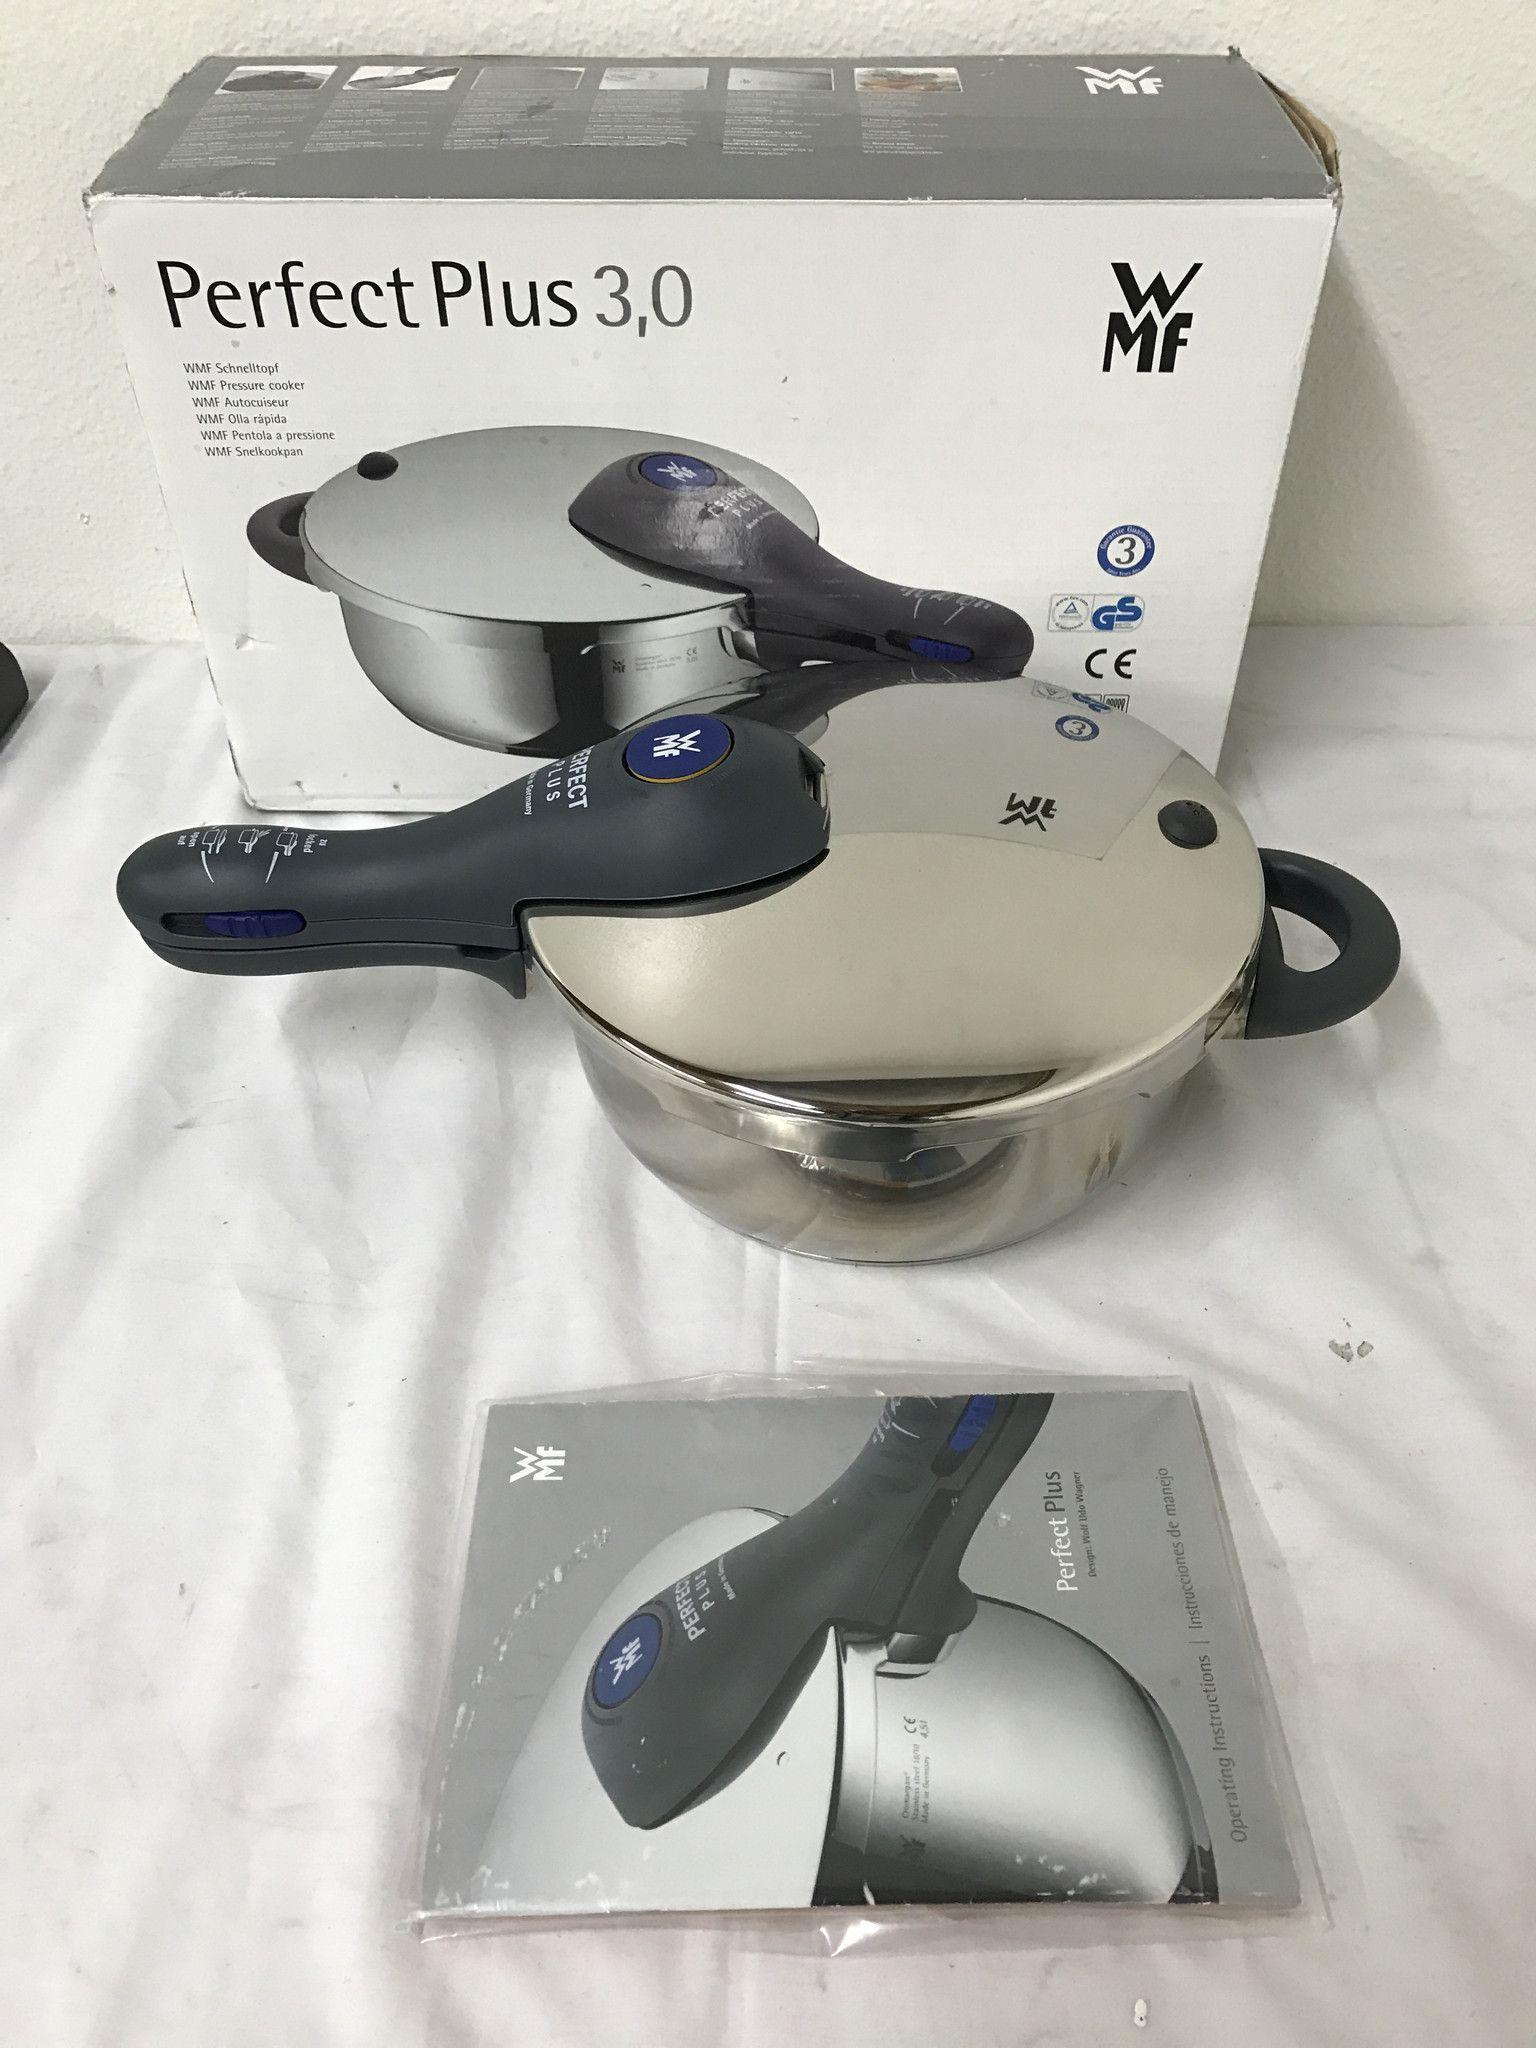 Wmf Perfect Plus 3 Quart Pressure Cooker Cooker Wmf